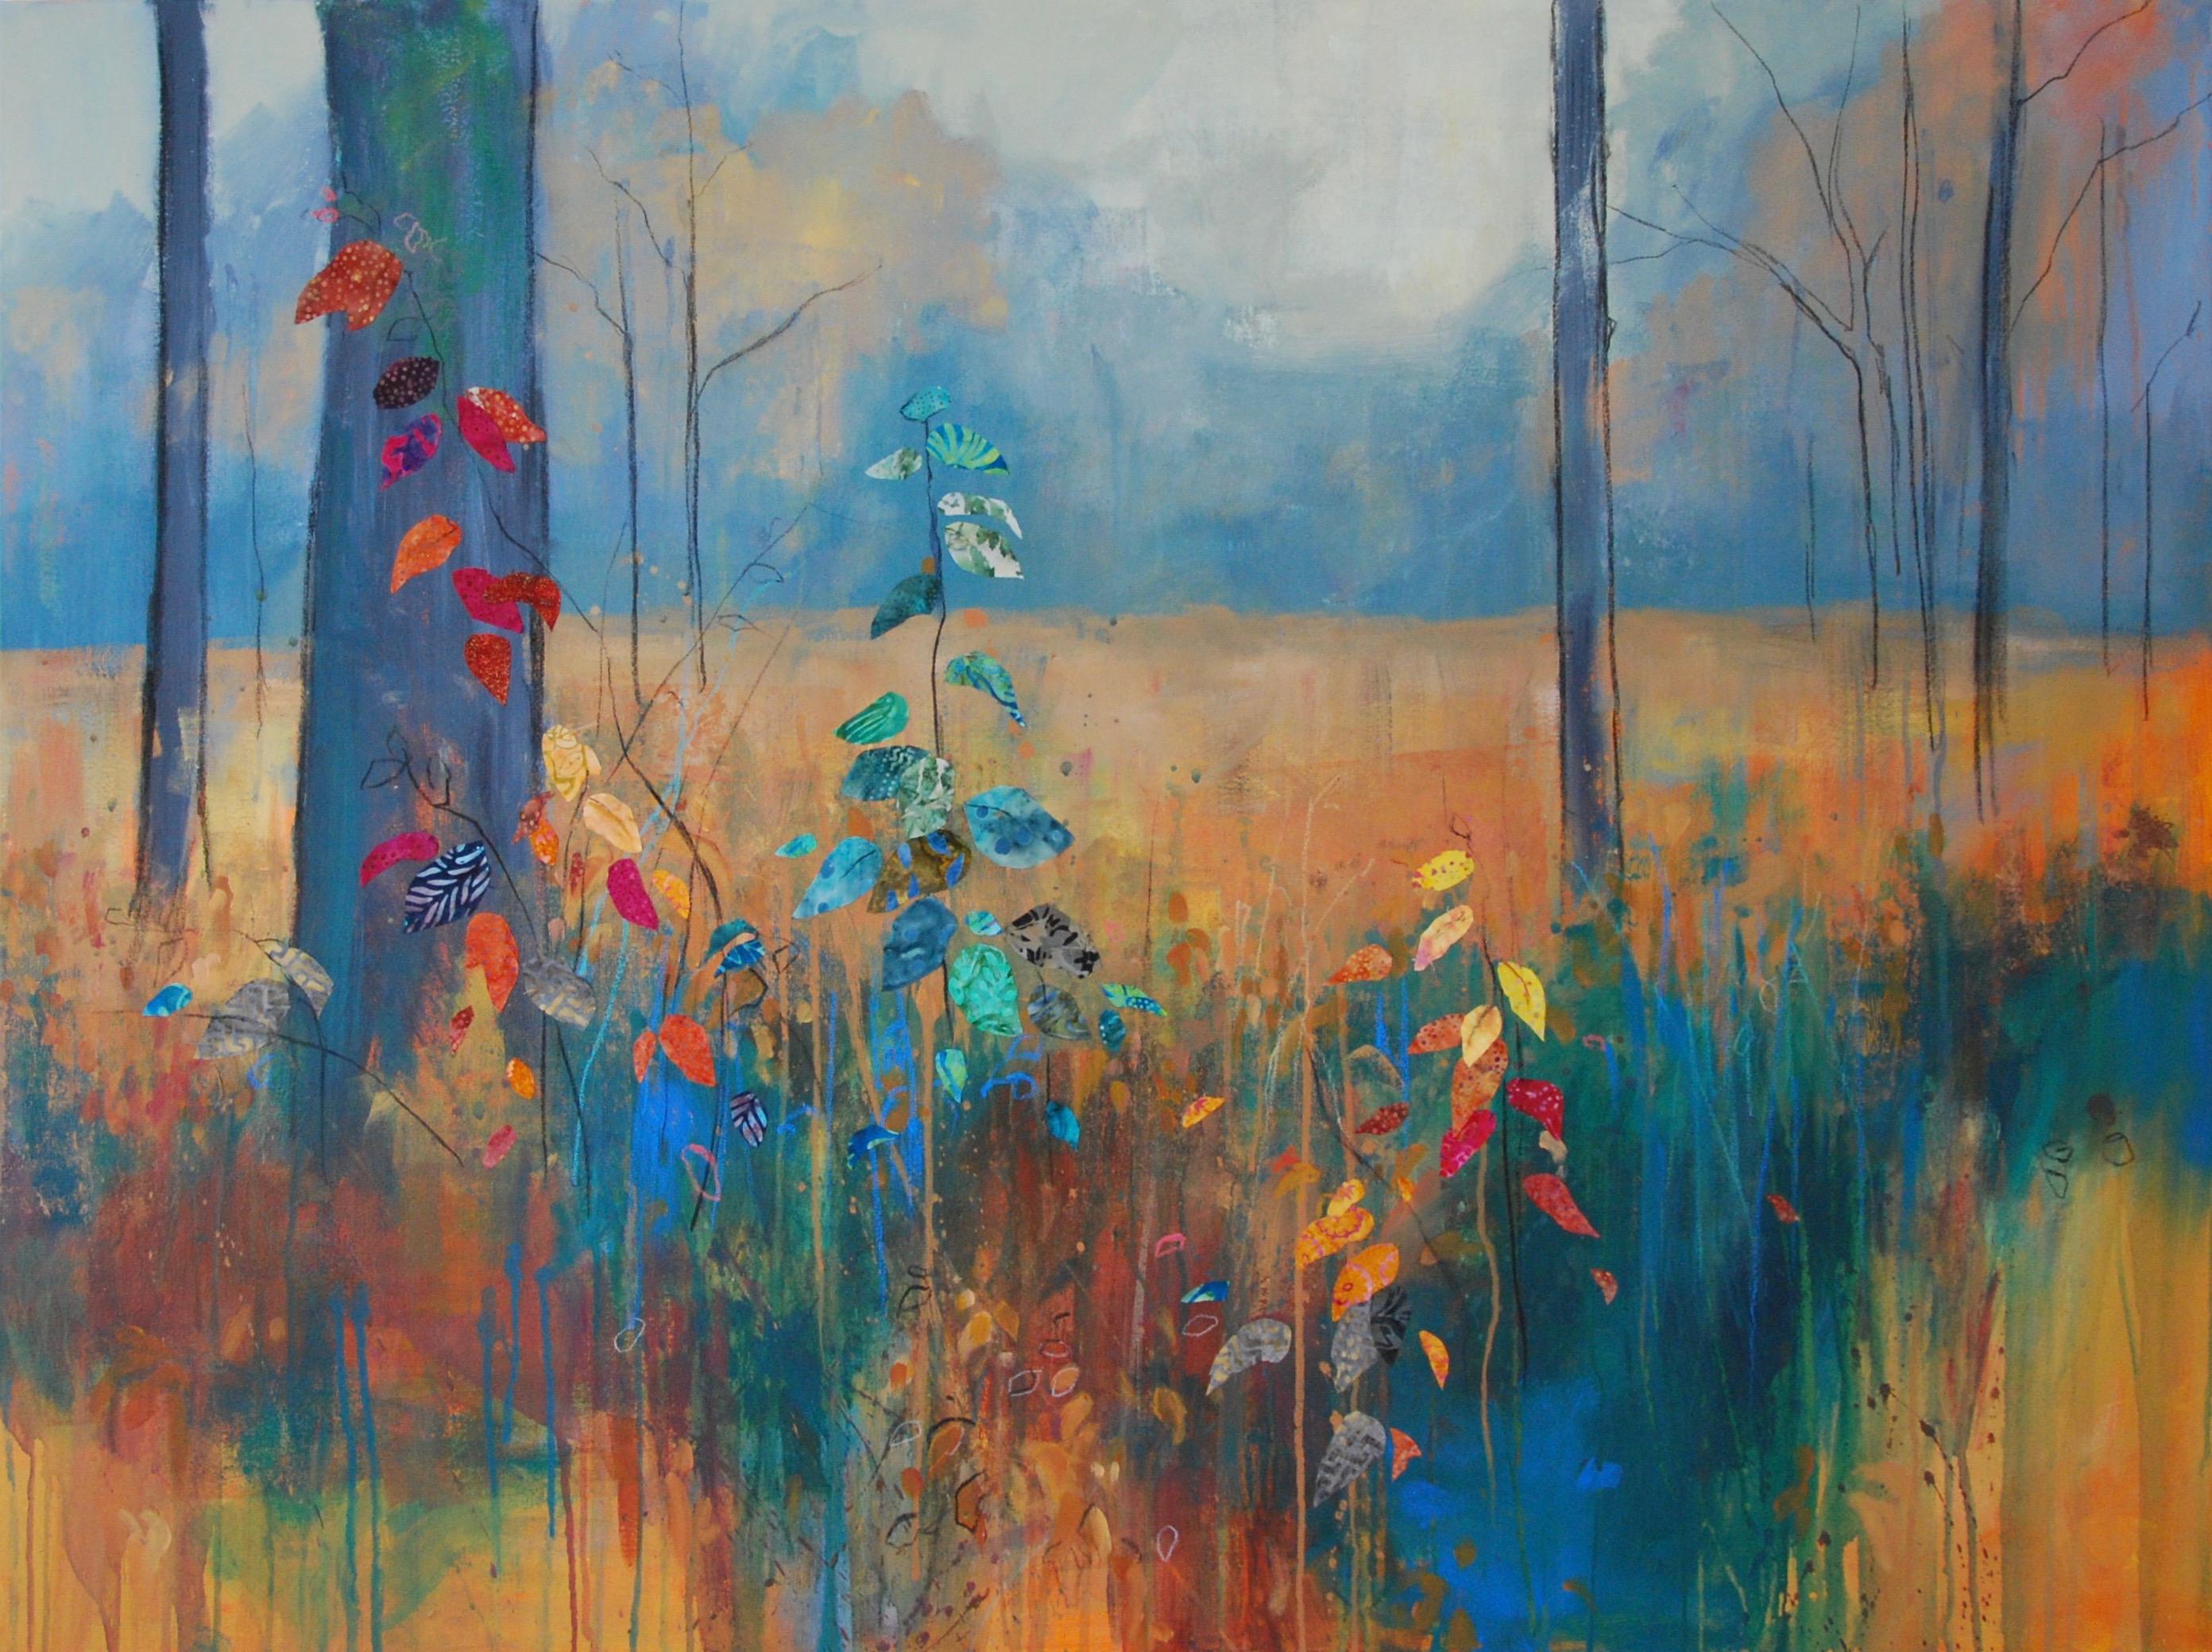 'Autumn Brights' Anna Perlin Mixed media, 91cmx122cm, 2016